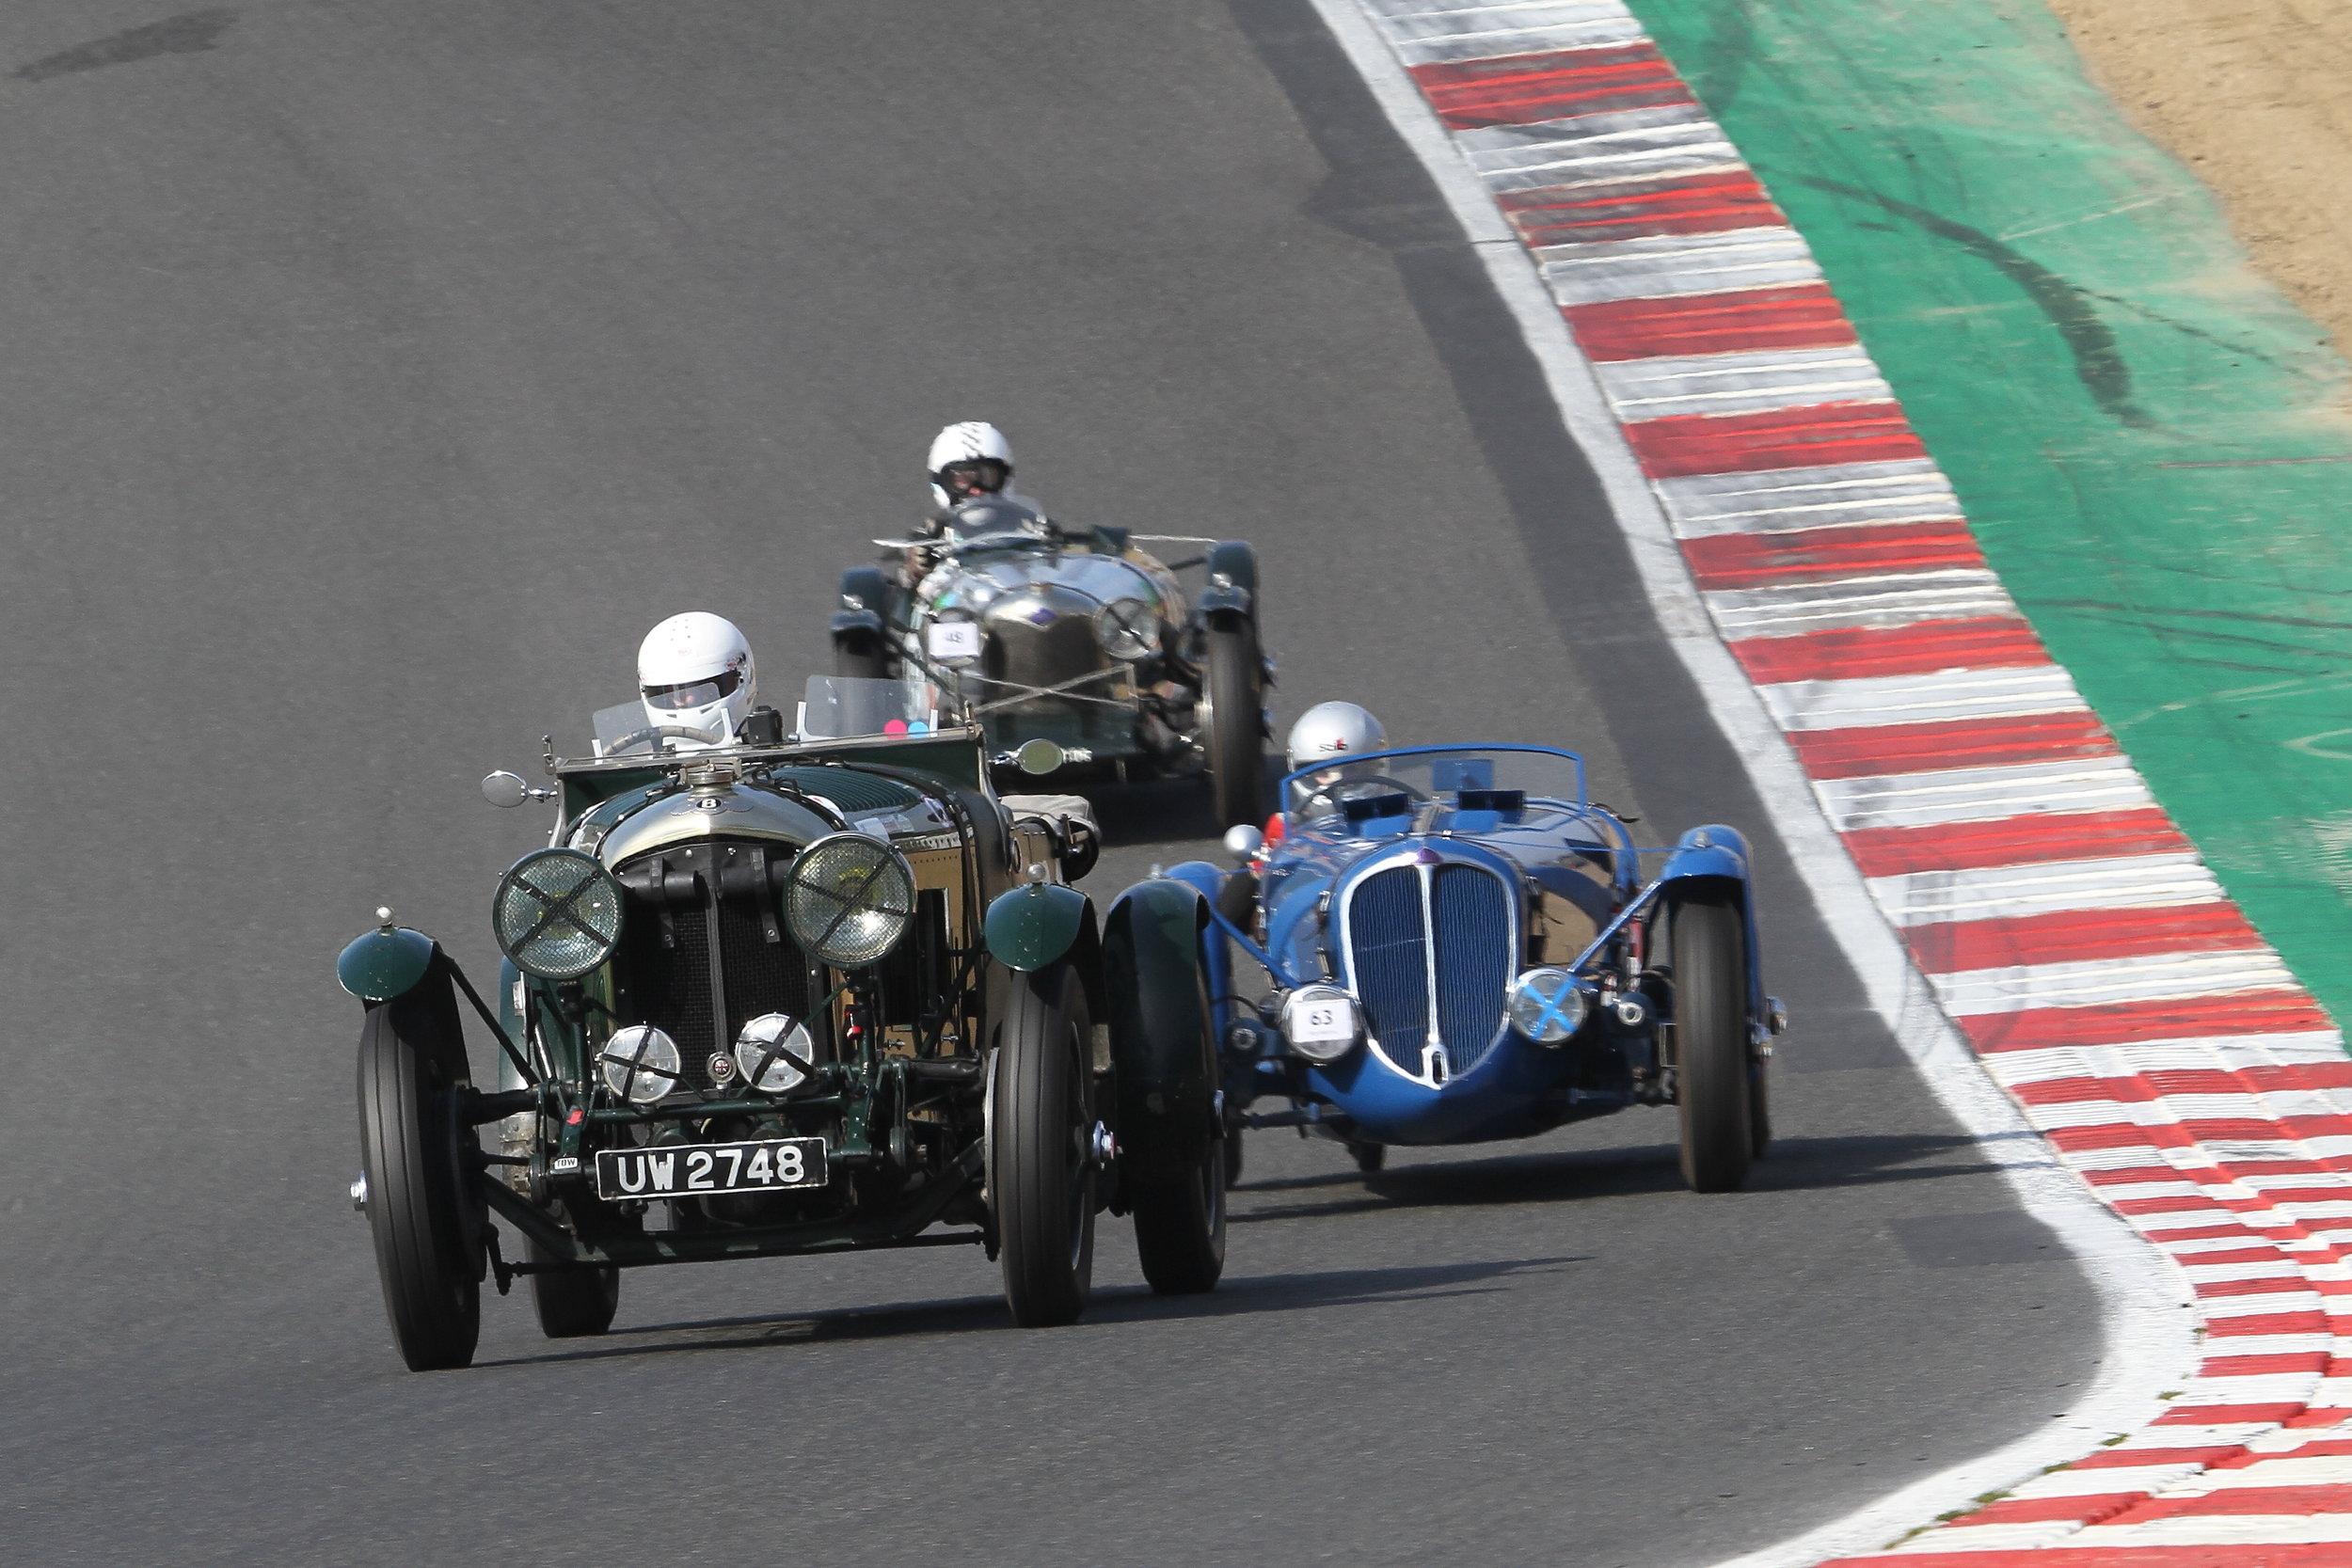 Carter (Bentley 4.5) running ahead of Smith (Delahaye 135S) and Emmerling (Riley Brooklands); Stefanie Broch